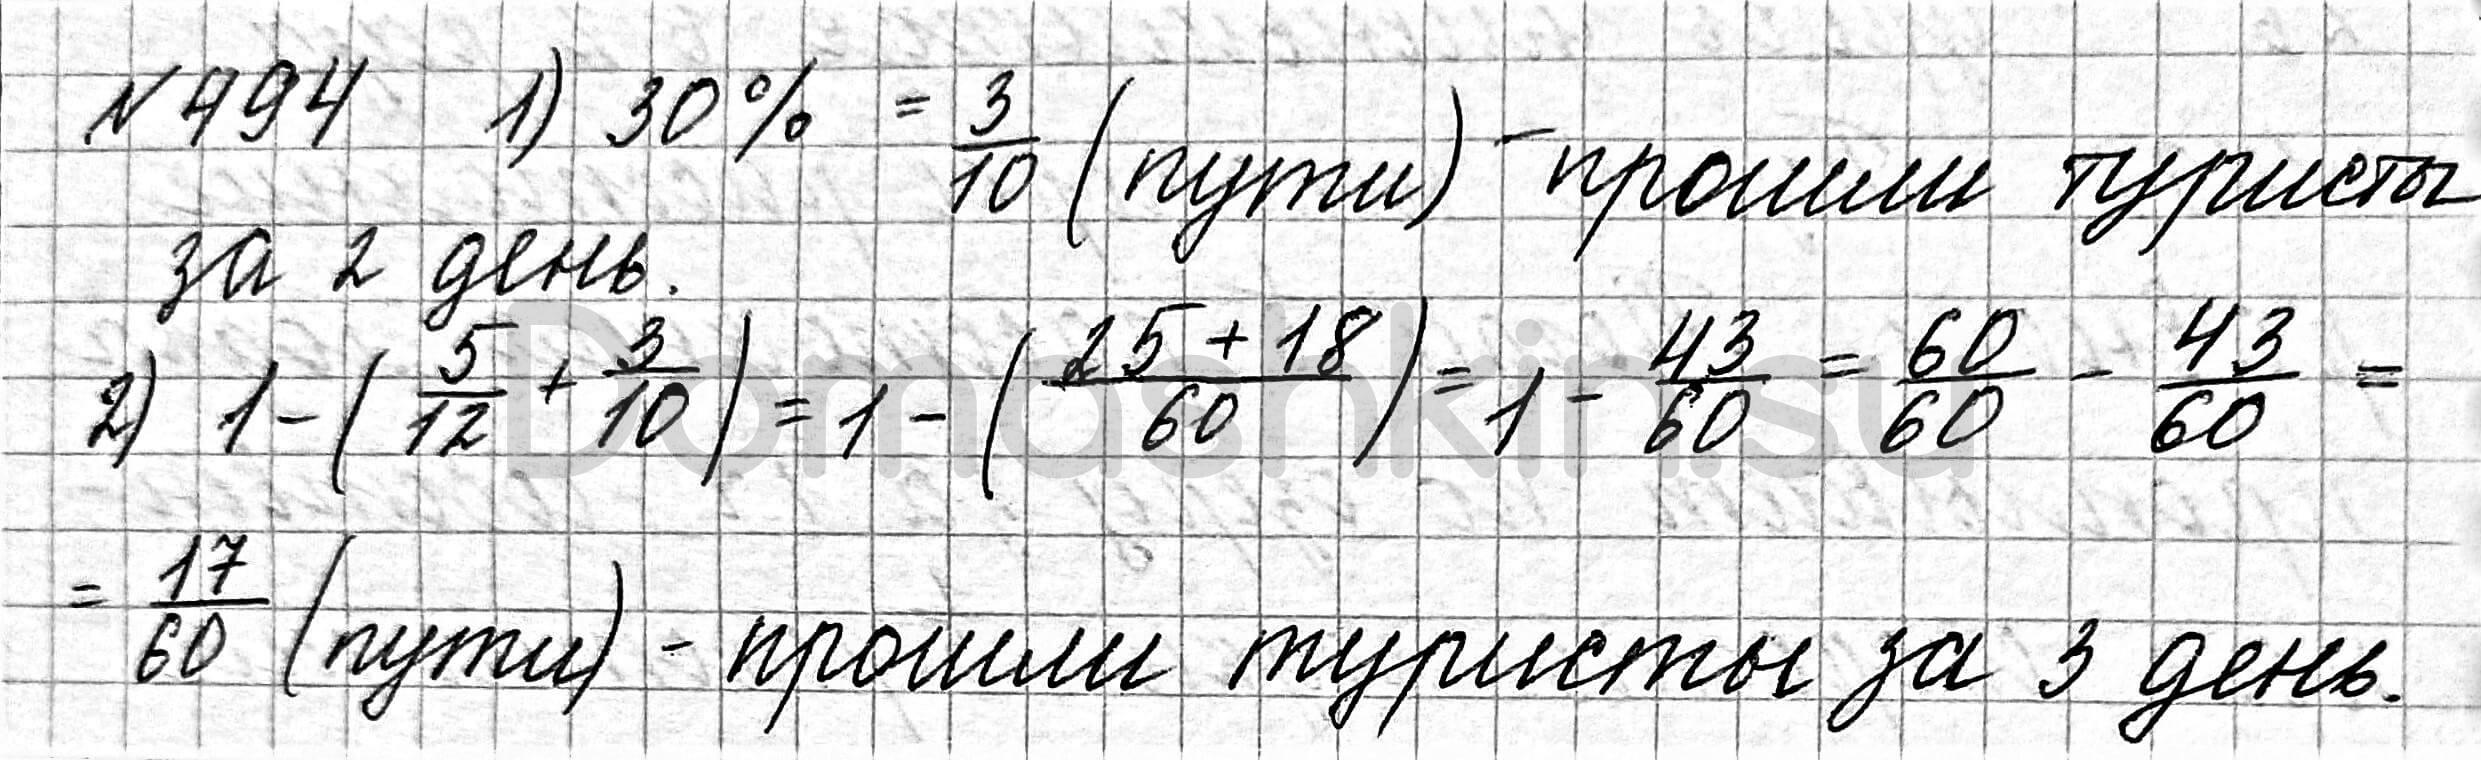 Математика 6 класс учебник Мерзляк номер 494 решение